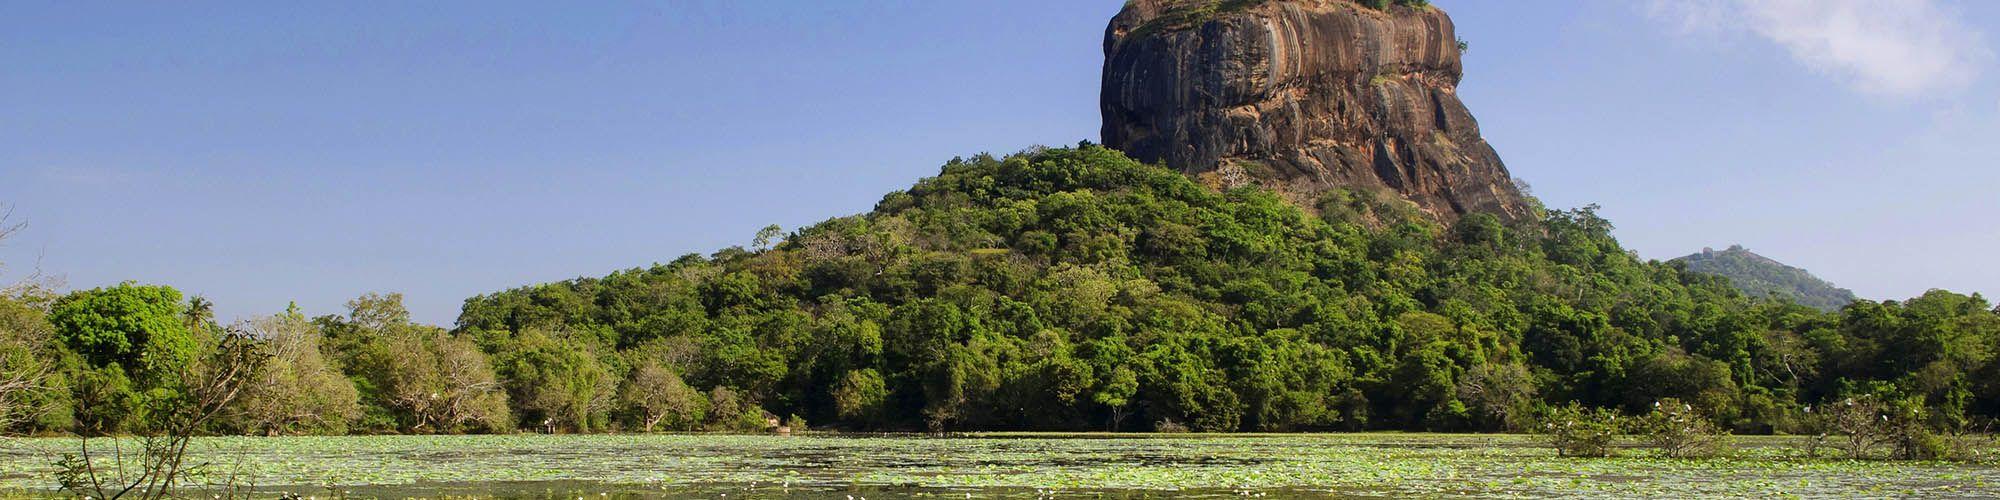 Sri Lanka - Lion Rock - Sigiriya